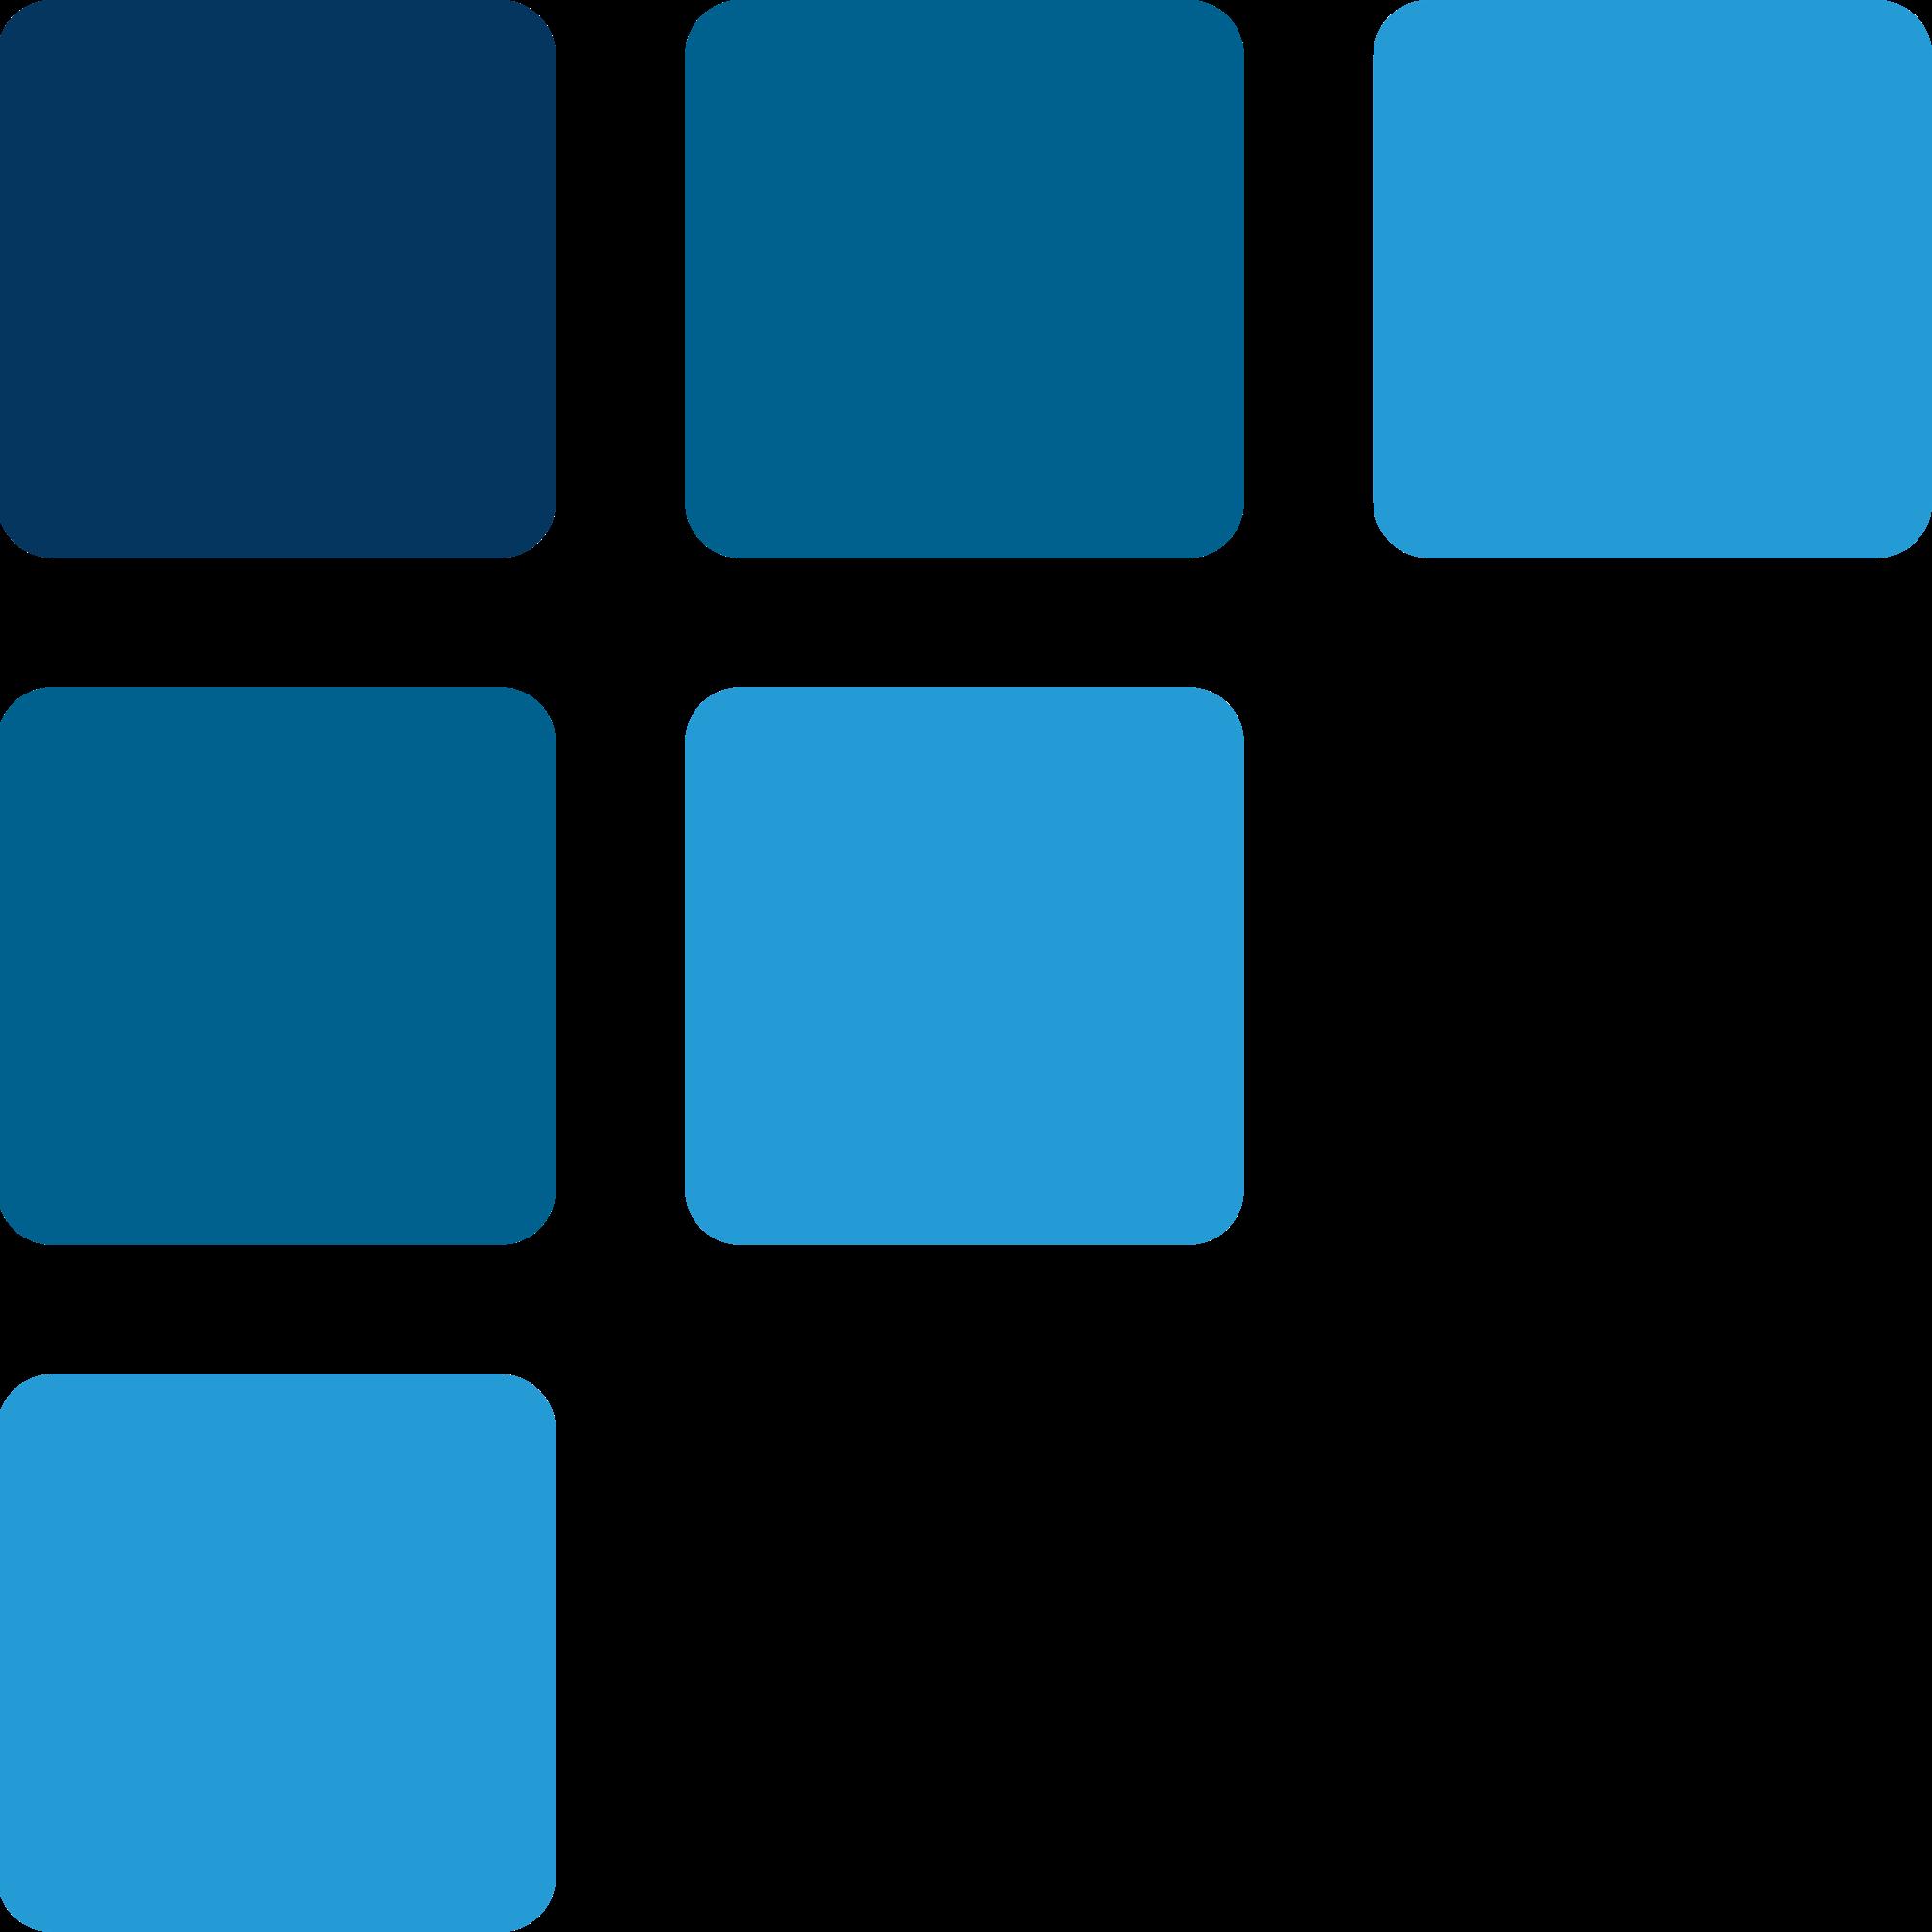 Forcerta logo